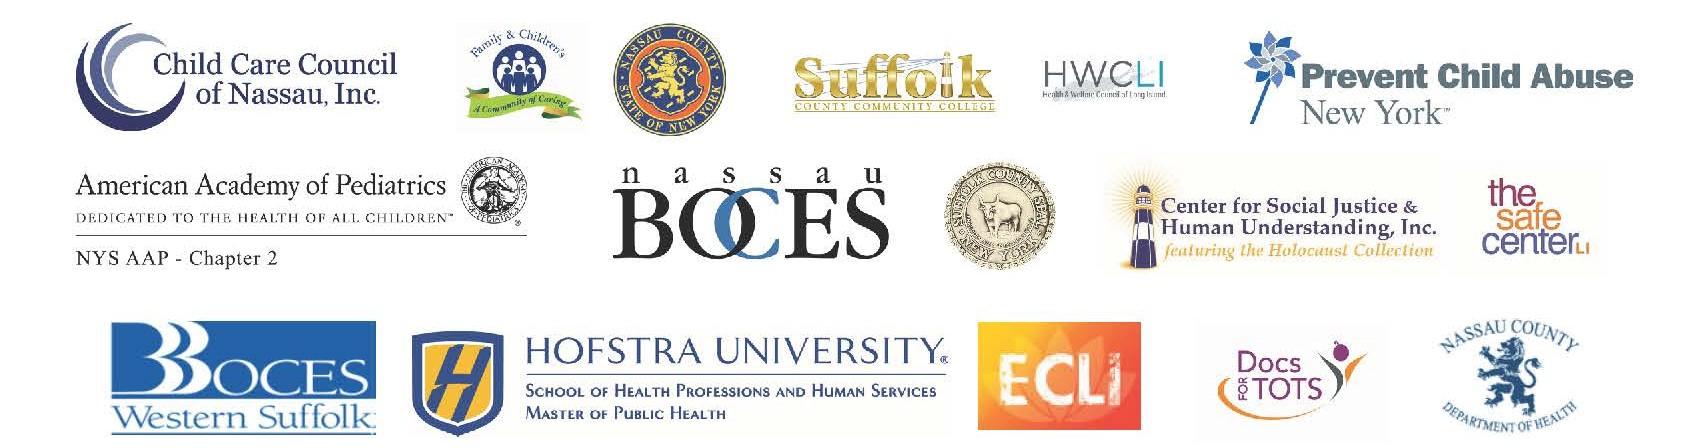 Organizations sponsoring screening